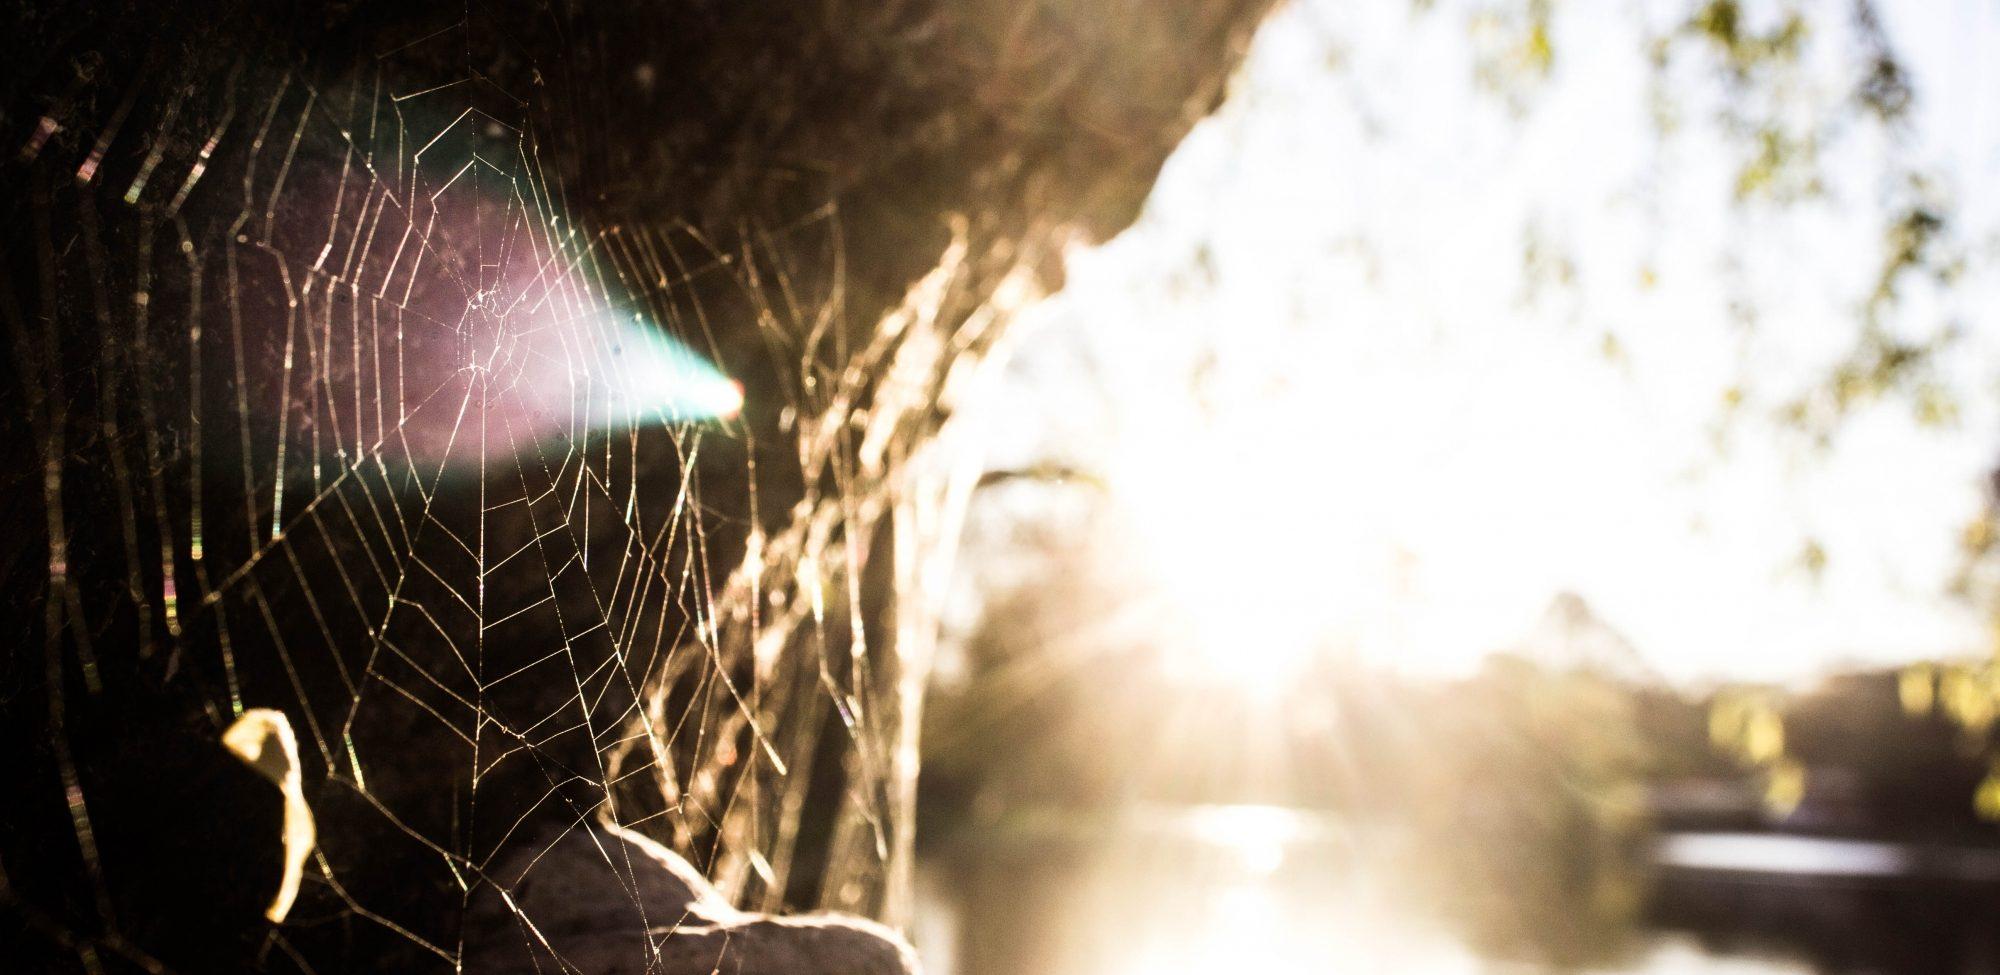 cobweb in sunlight